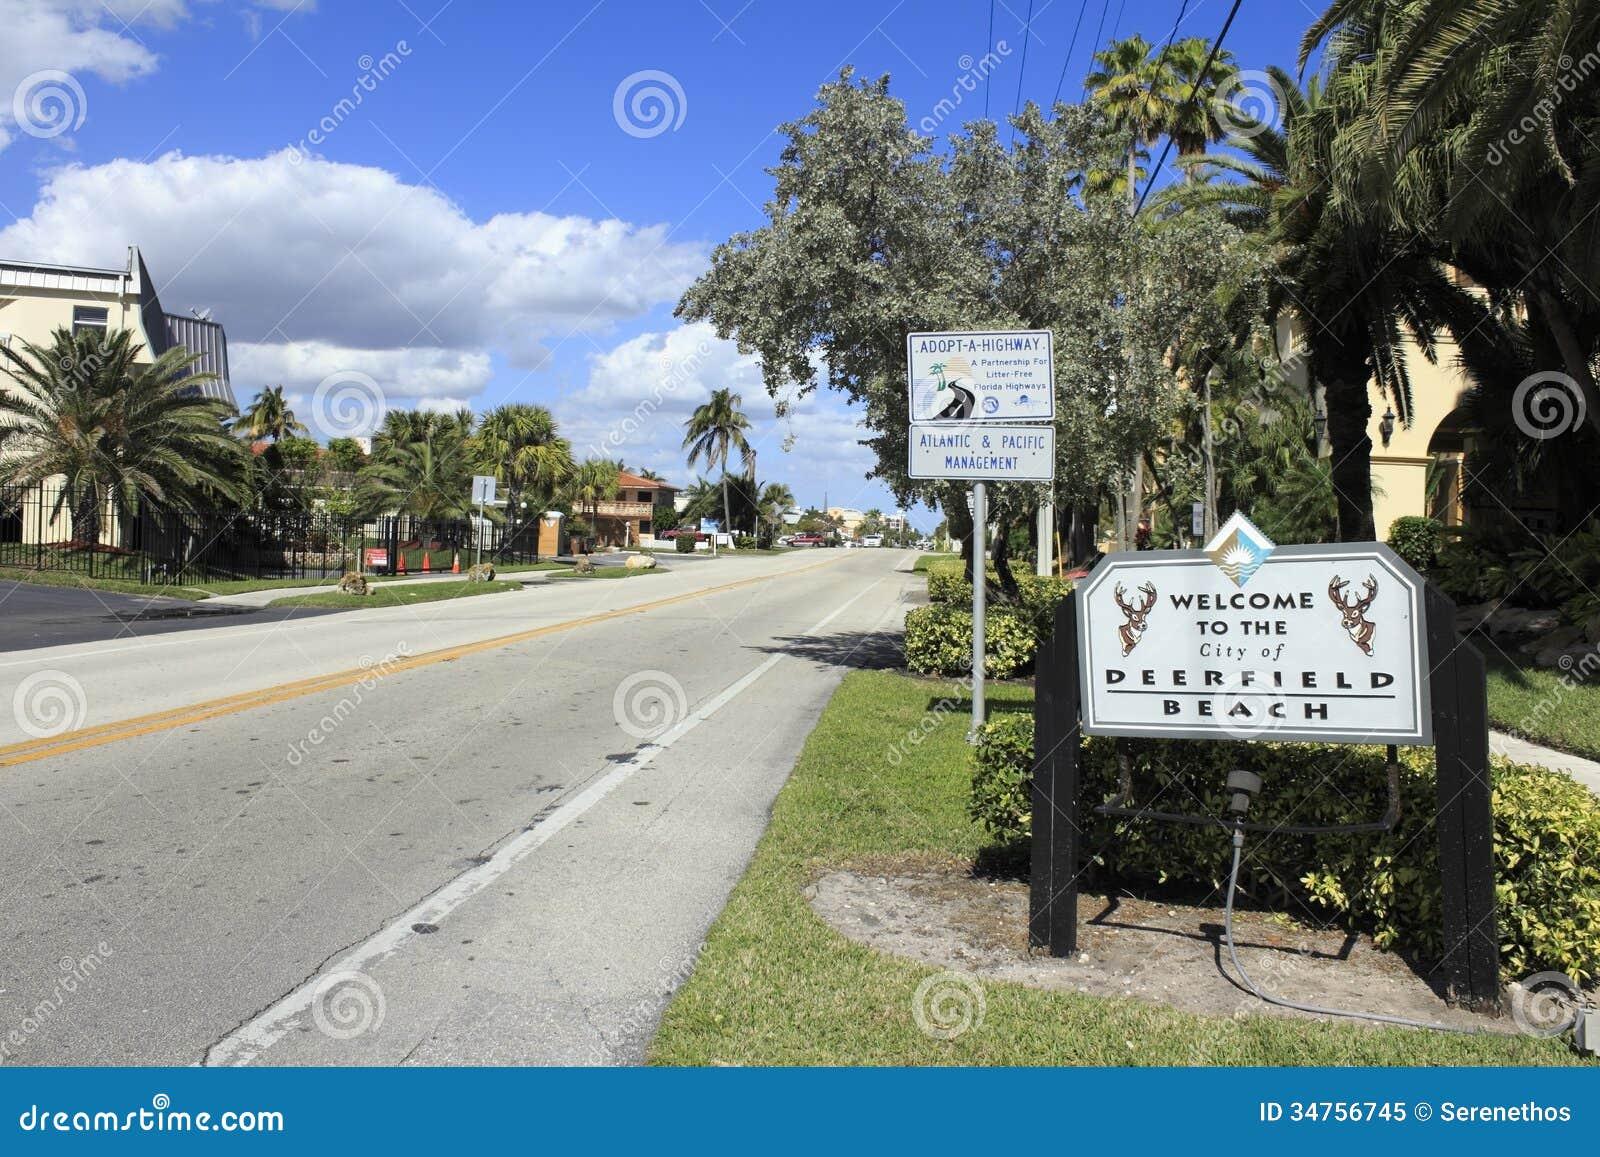 Palm Beach To Deerfield Beach